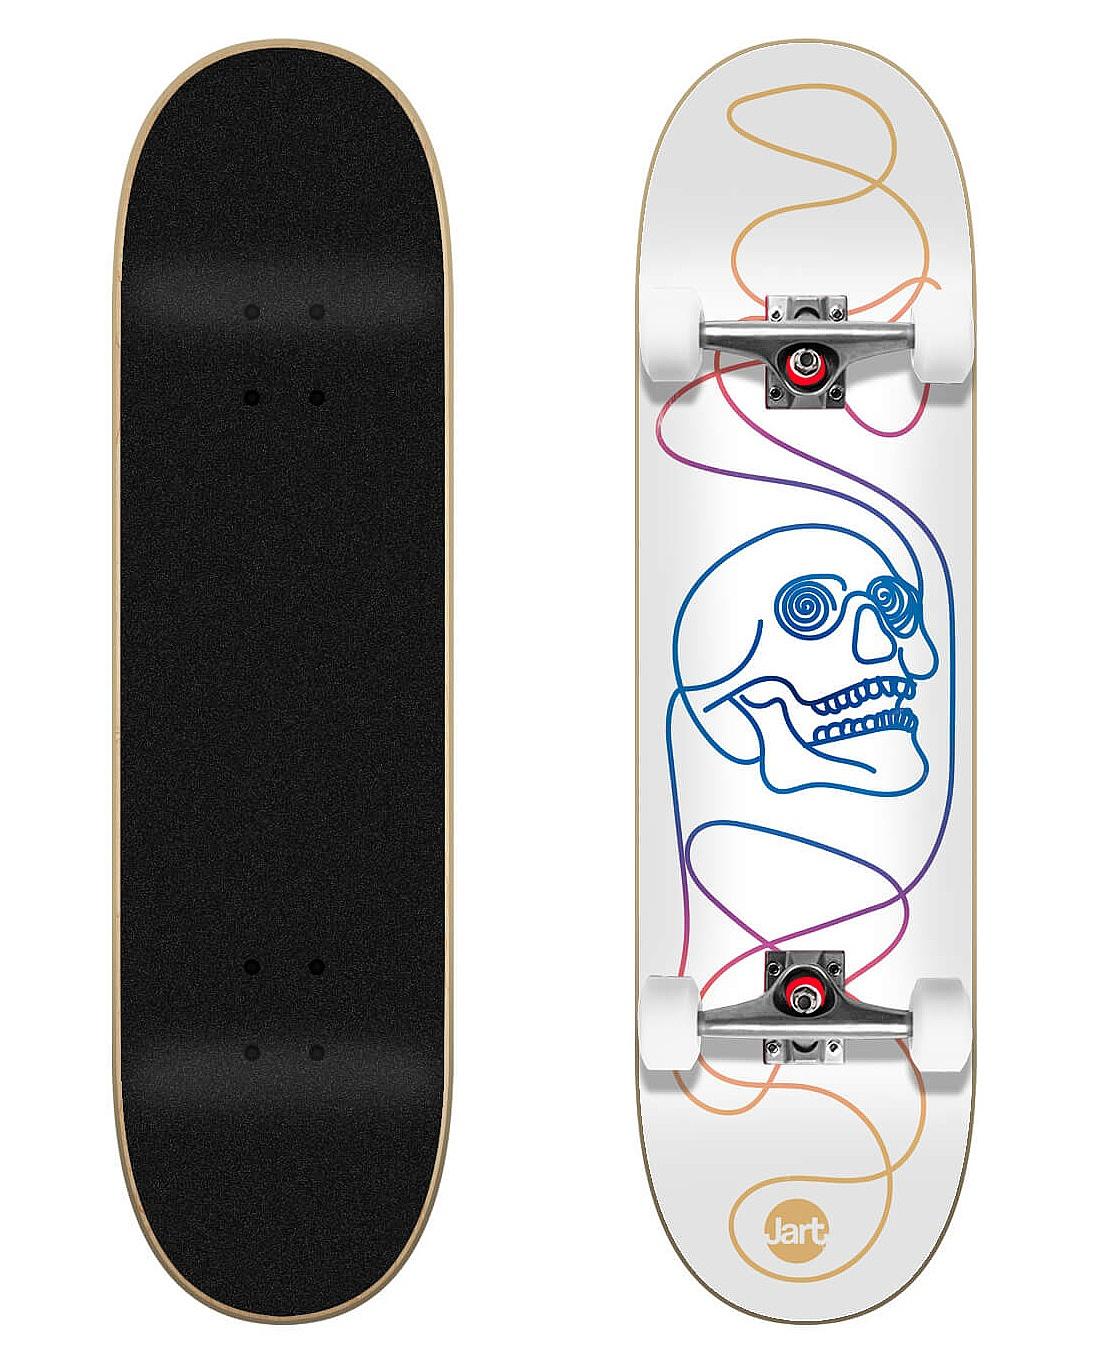 skateboard Jart Telesketch Complete - JACO0020C-005 8.25